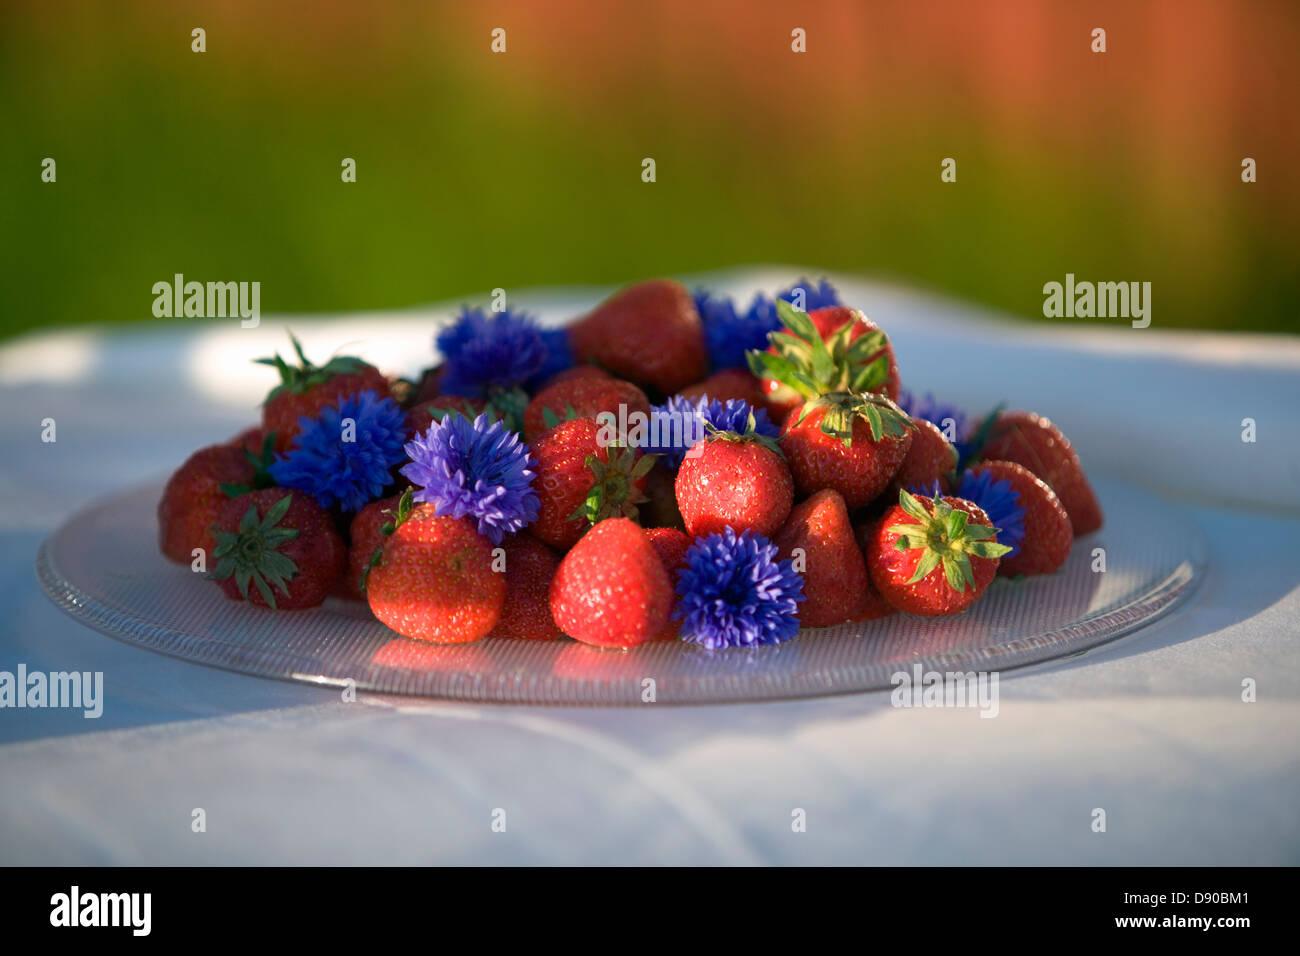 Fresas, Fejan, archipiélago de Estocolmo, Suecia. Foto de stock